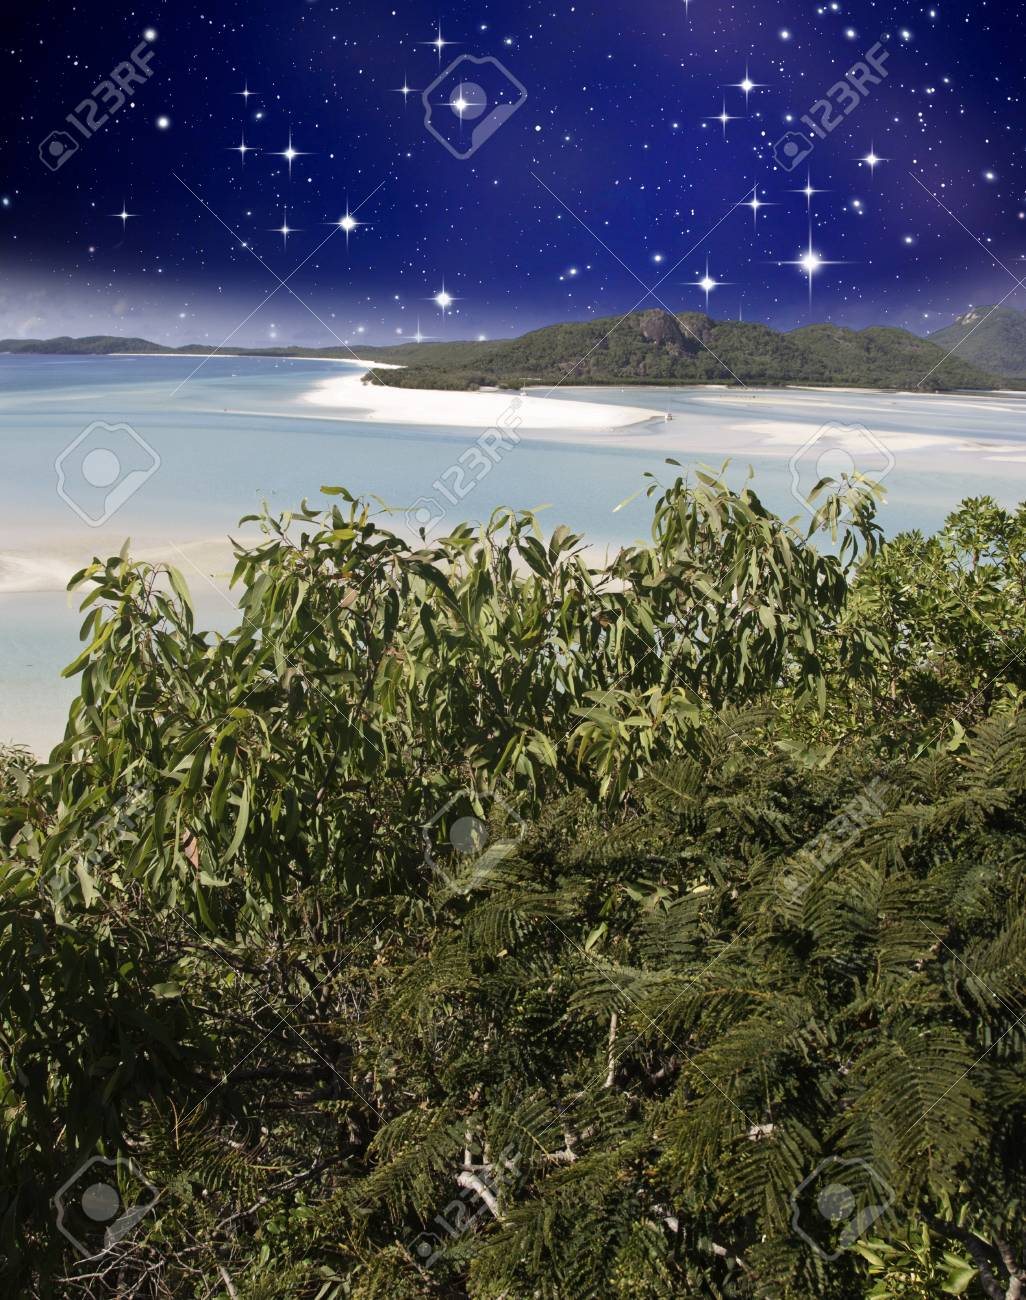 Starry Night in the Whitsunday Archipelago, Queensland, Australia Stock Photo - 12171779